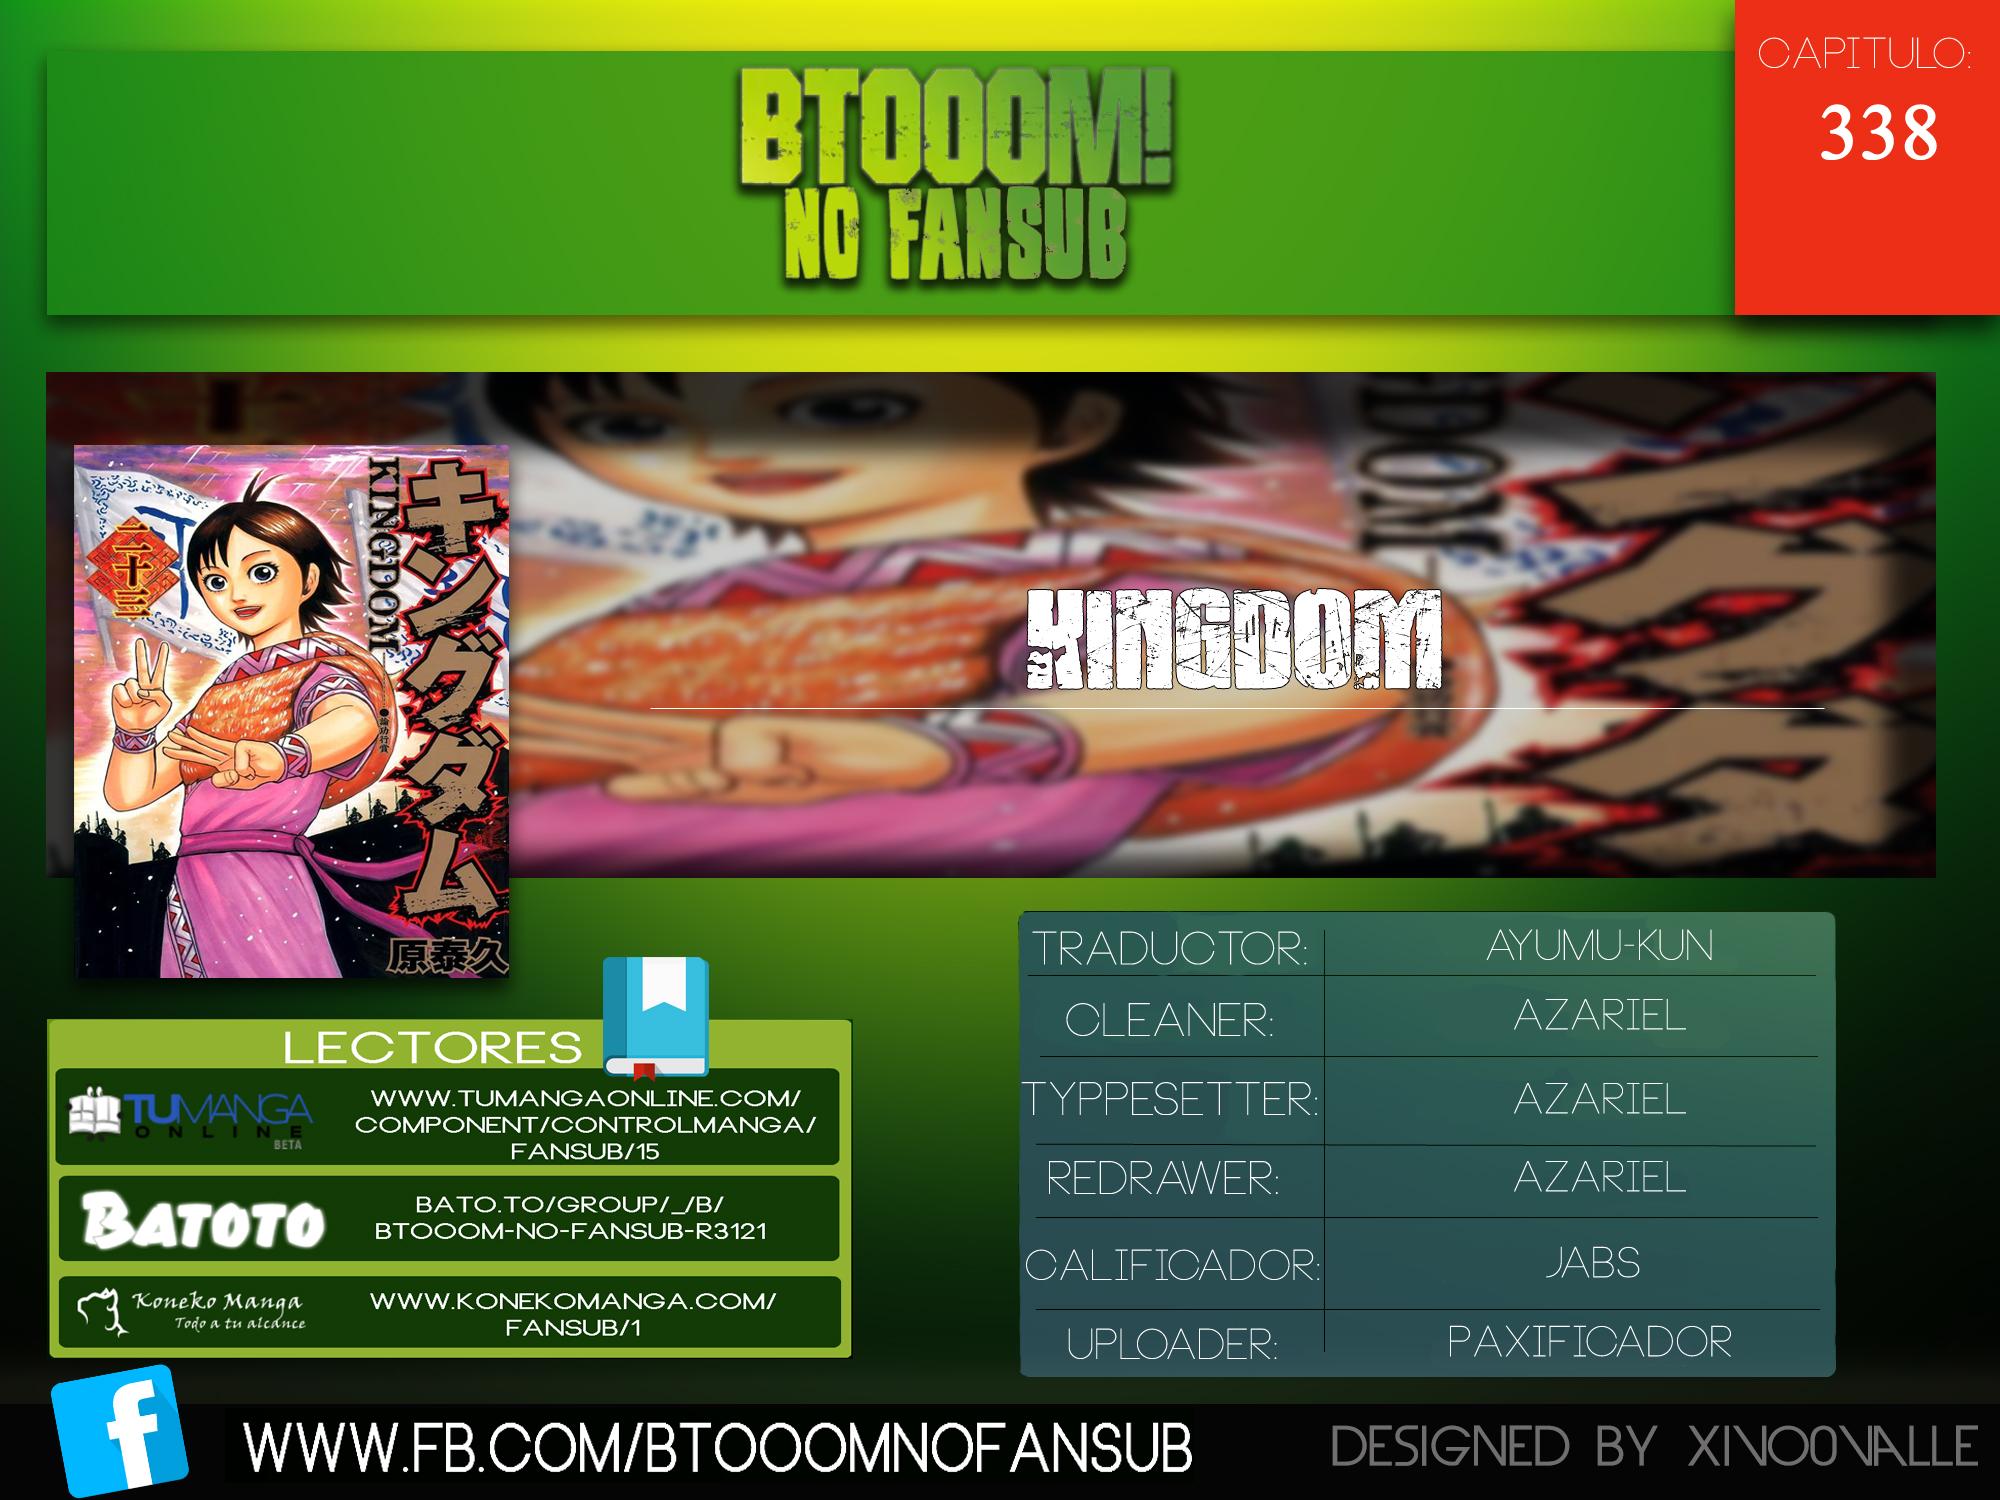 http://c5.ninemanga.com/es_manga/19/12307/360921/2078750ea356ba9fd472655dec36c068.jpg Page 1